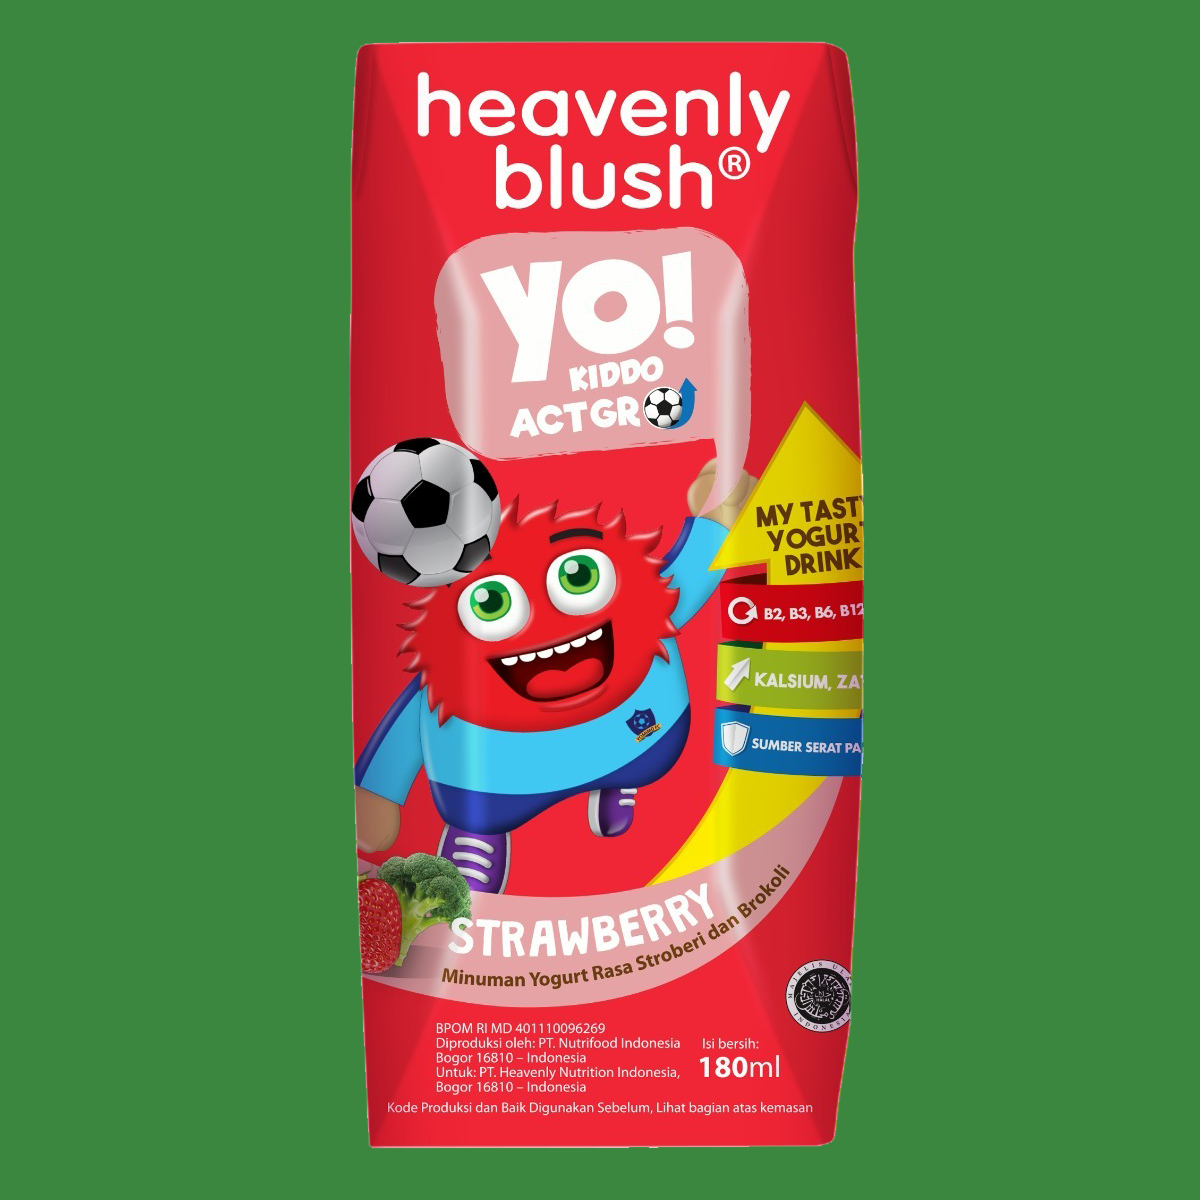 Heavenly Blush YO Strawberry Broccoli - Heavenly Mart